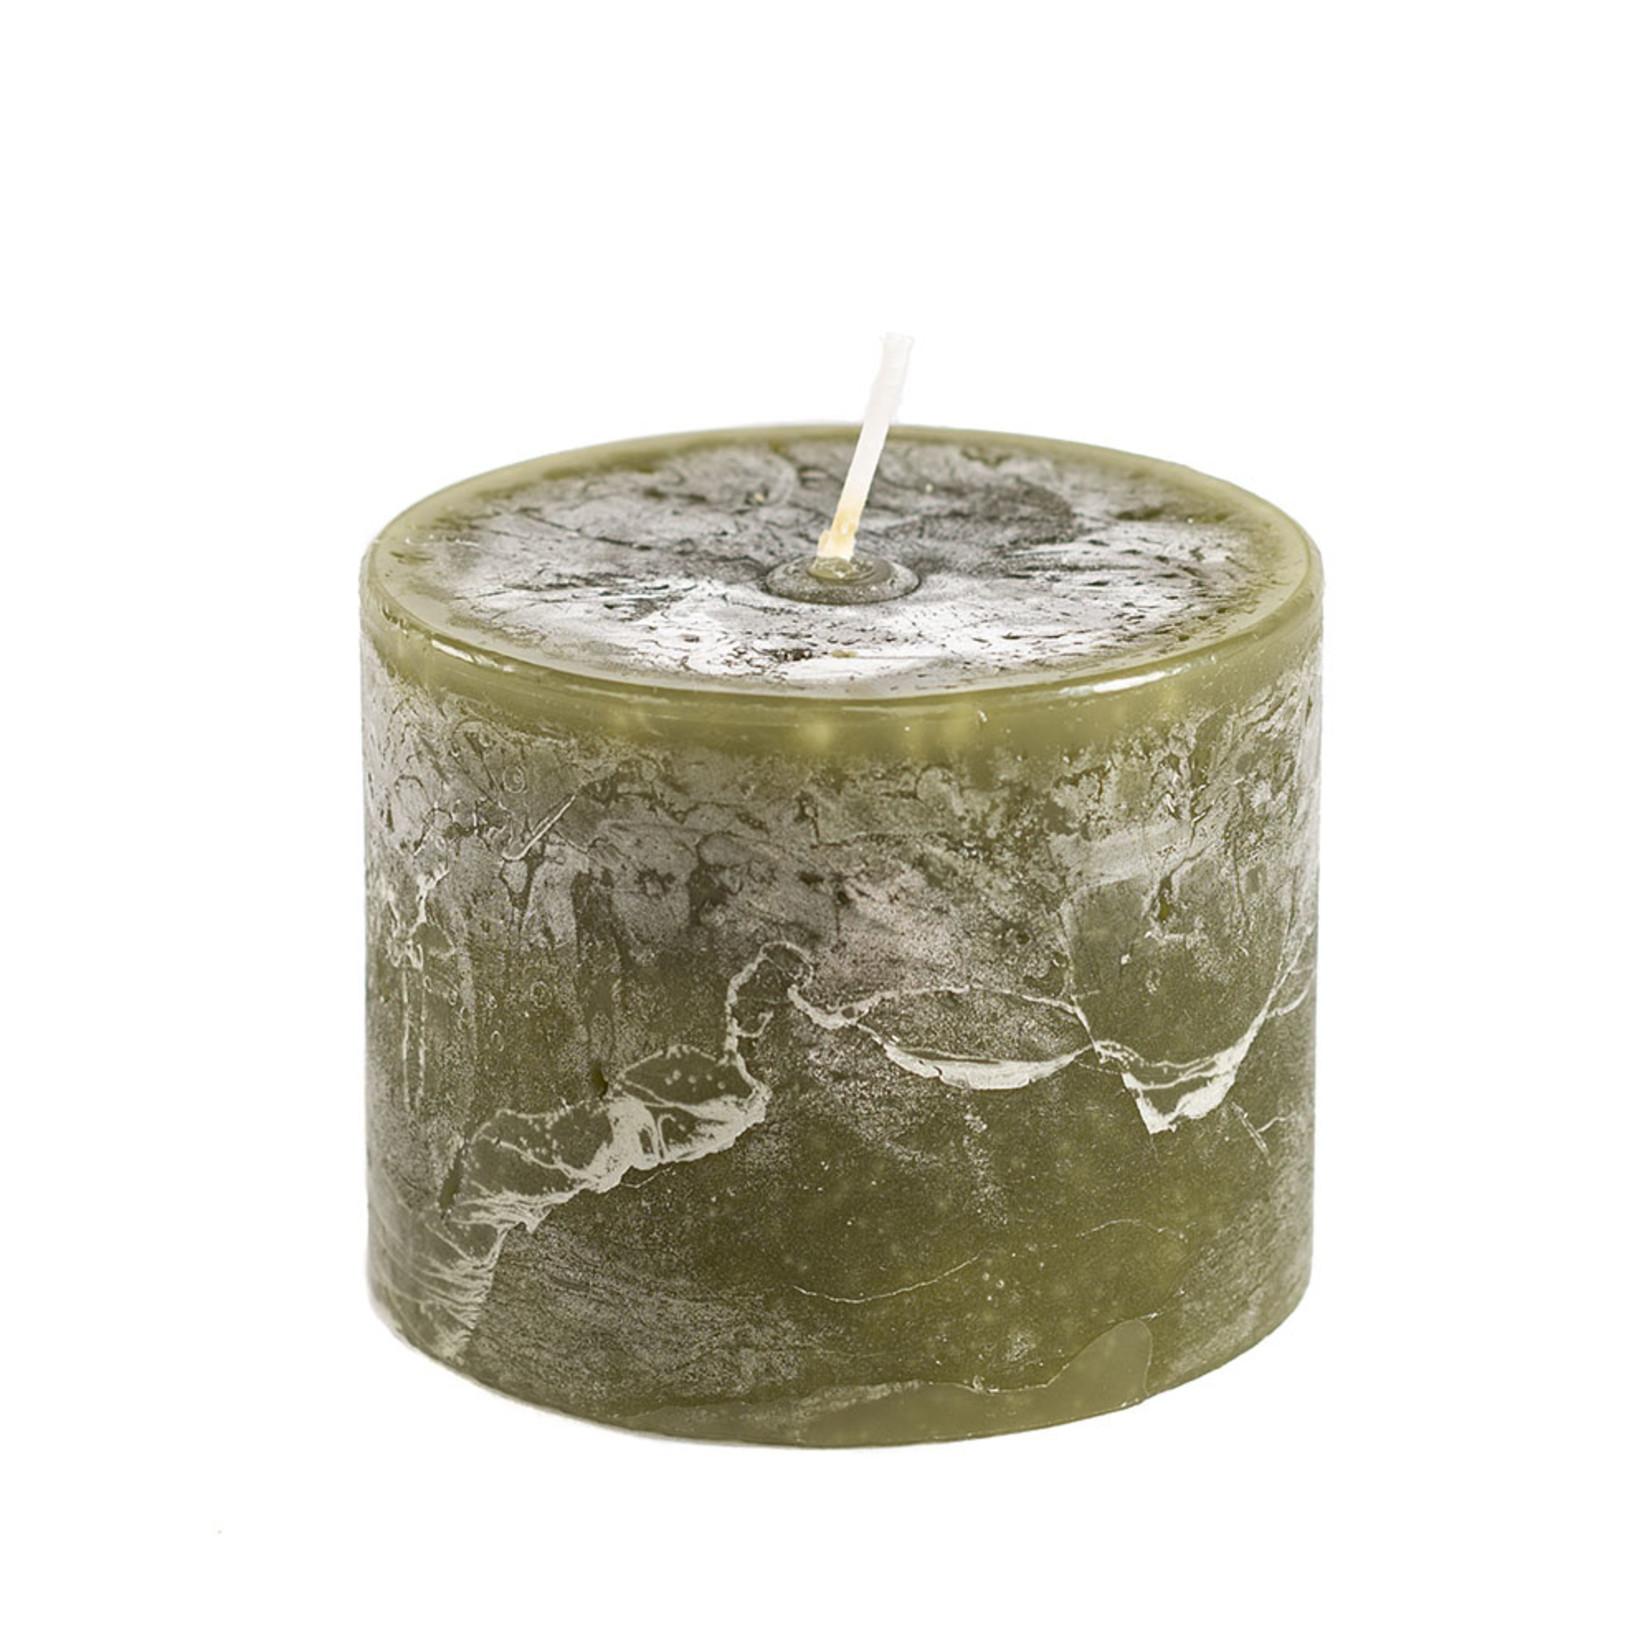 Home Society Pillar Candle 9x7cm Green